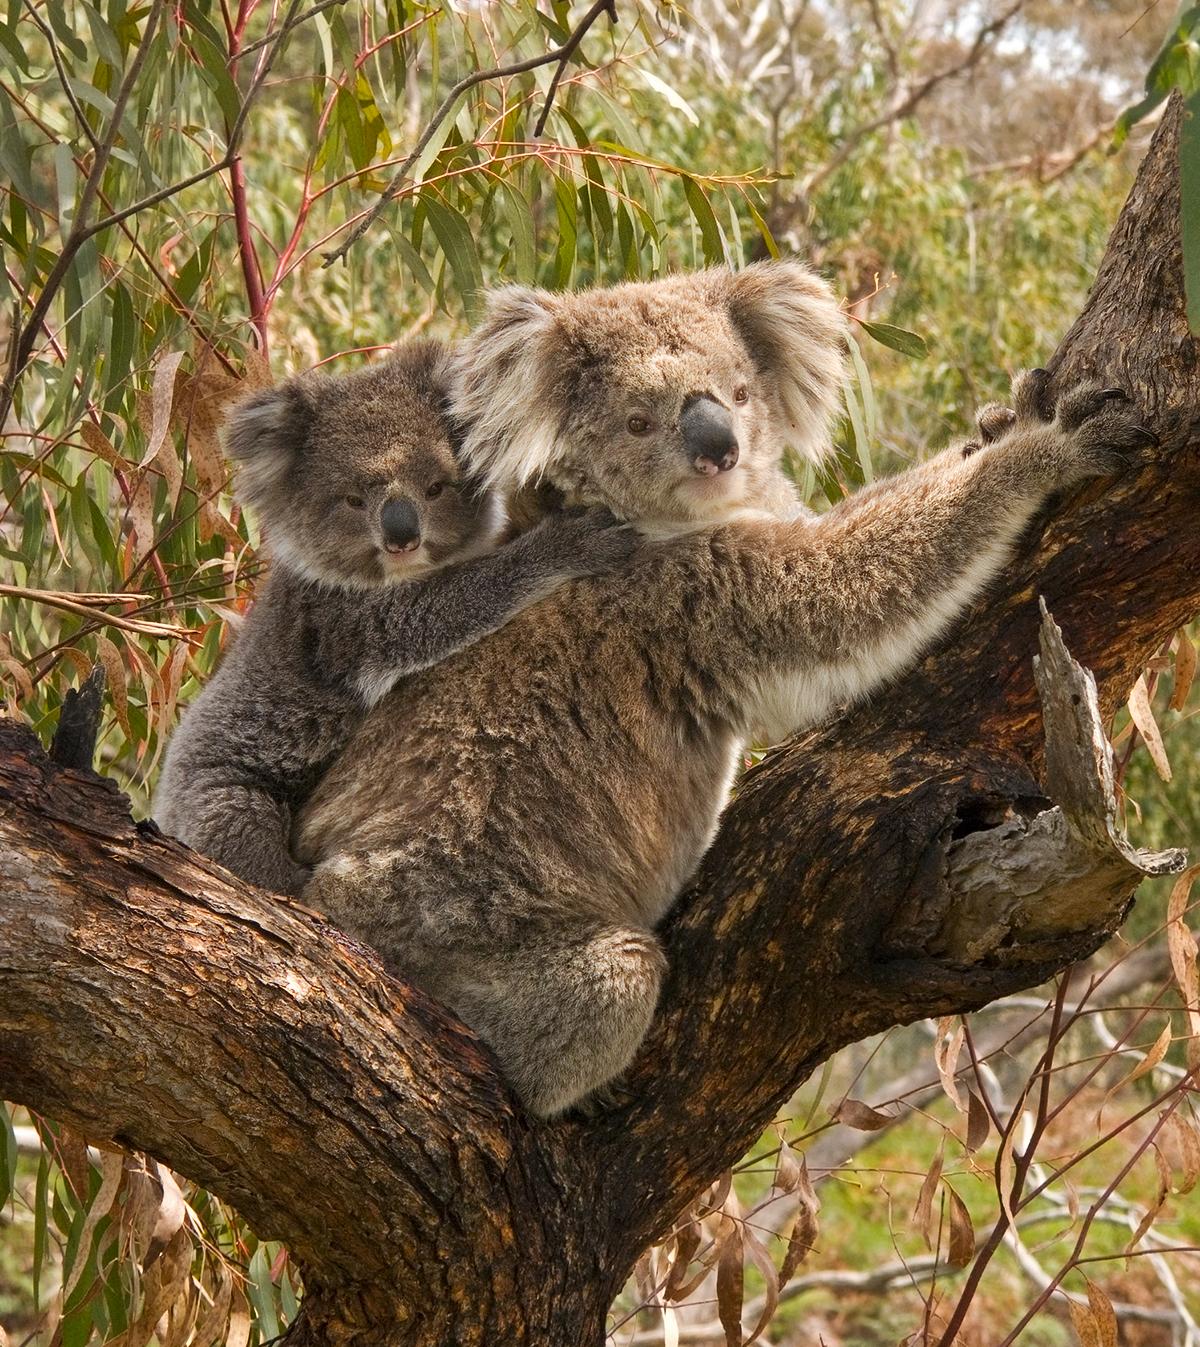 File:Koala and joey.jp...